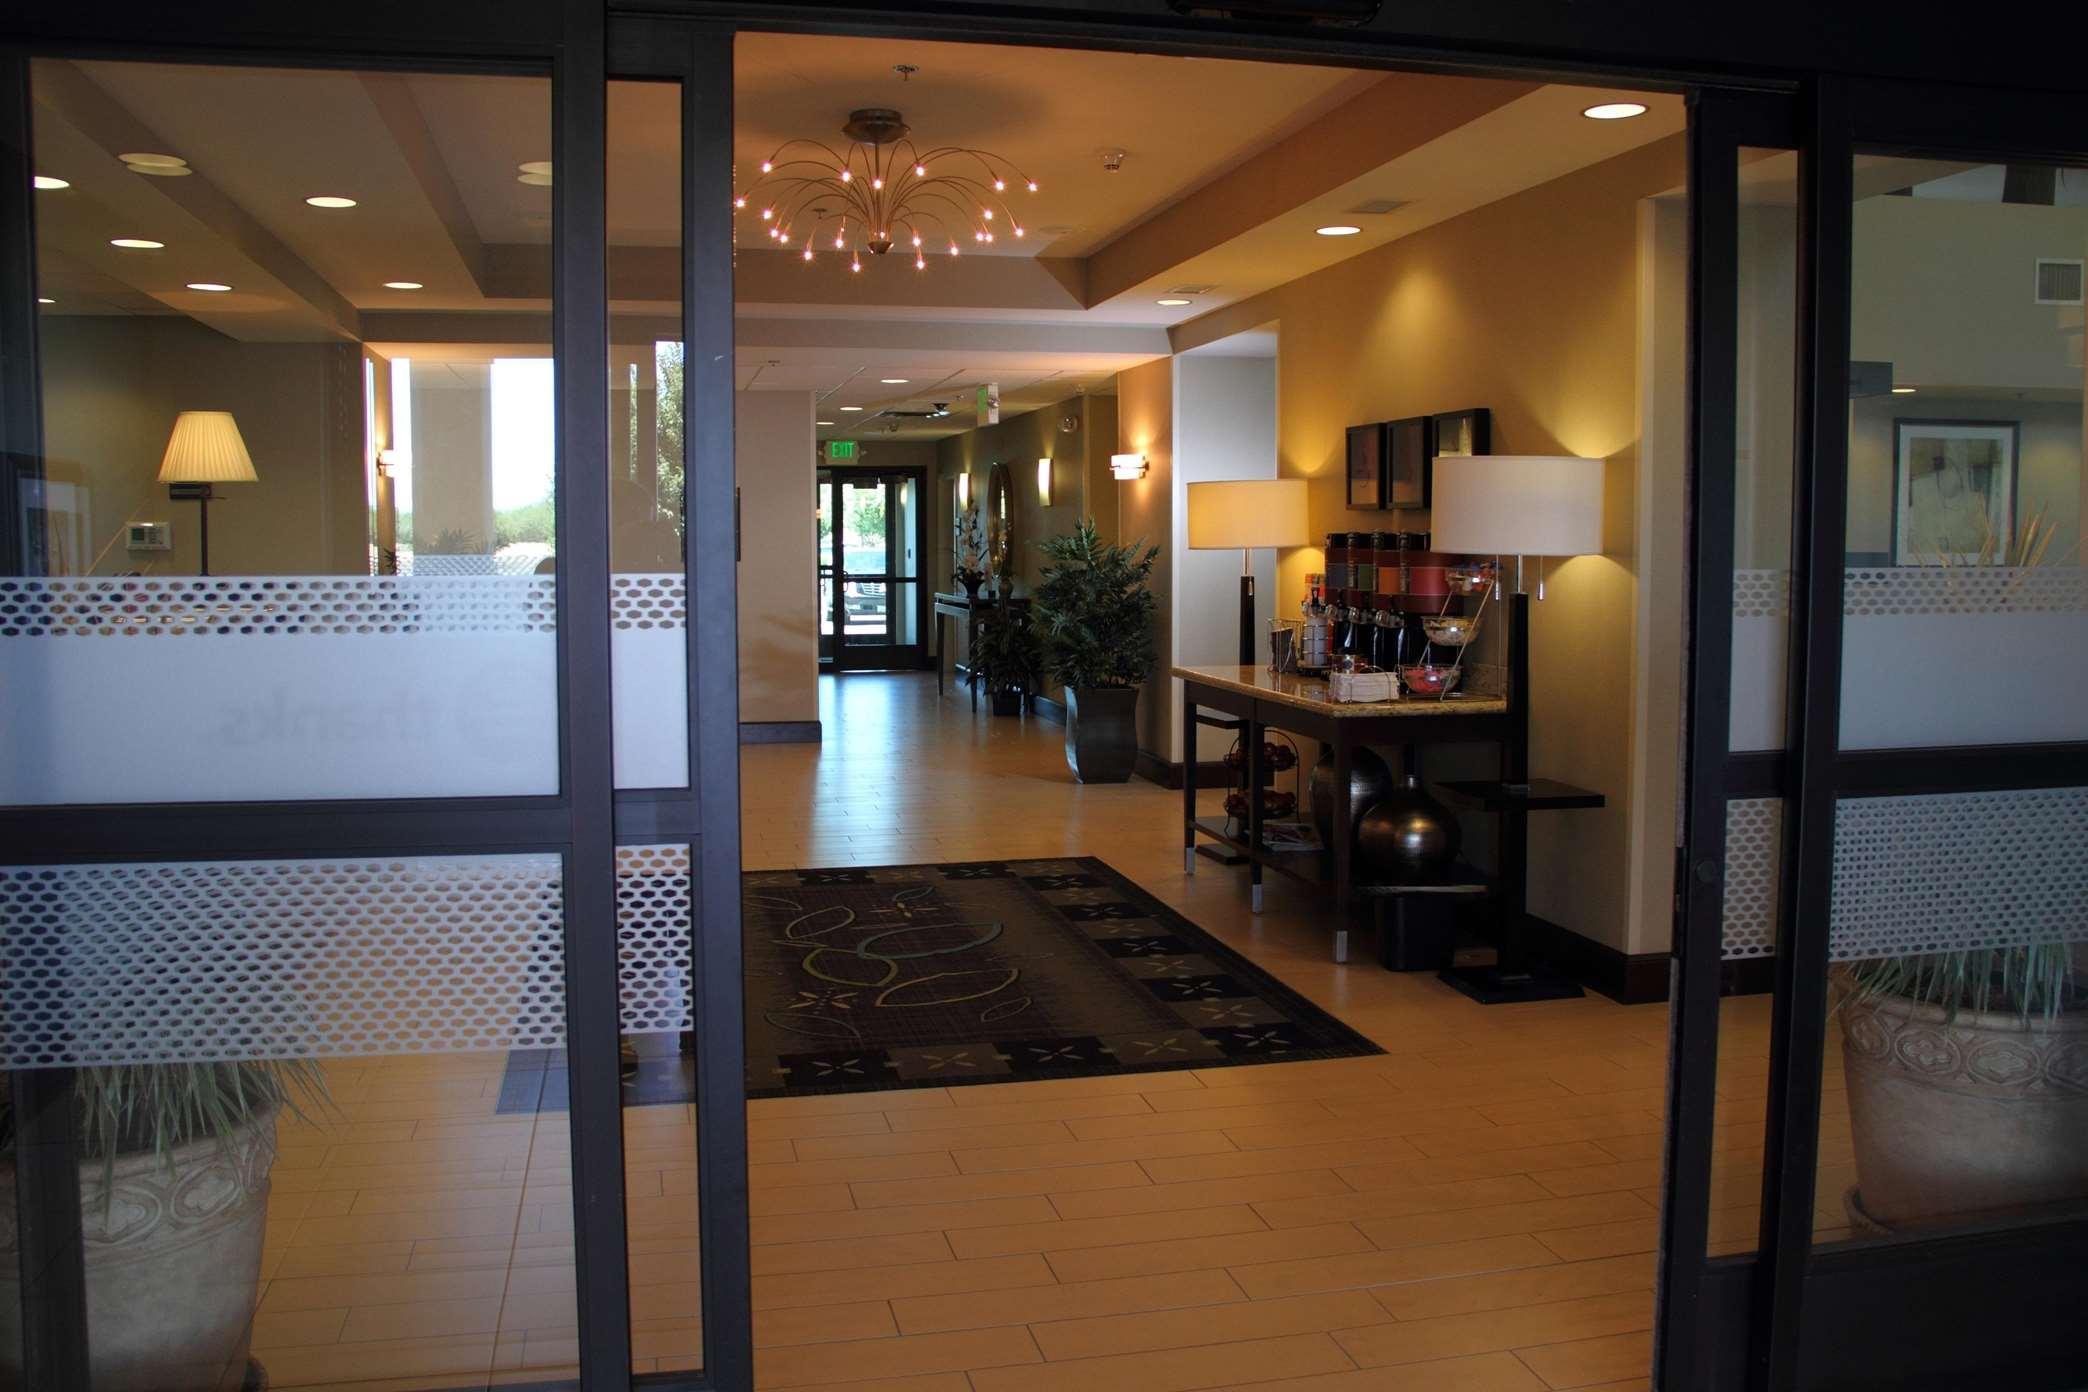 Hampton Inn & Suites Manteca image 3